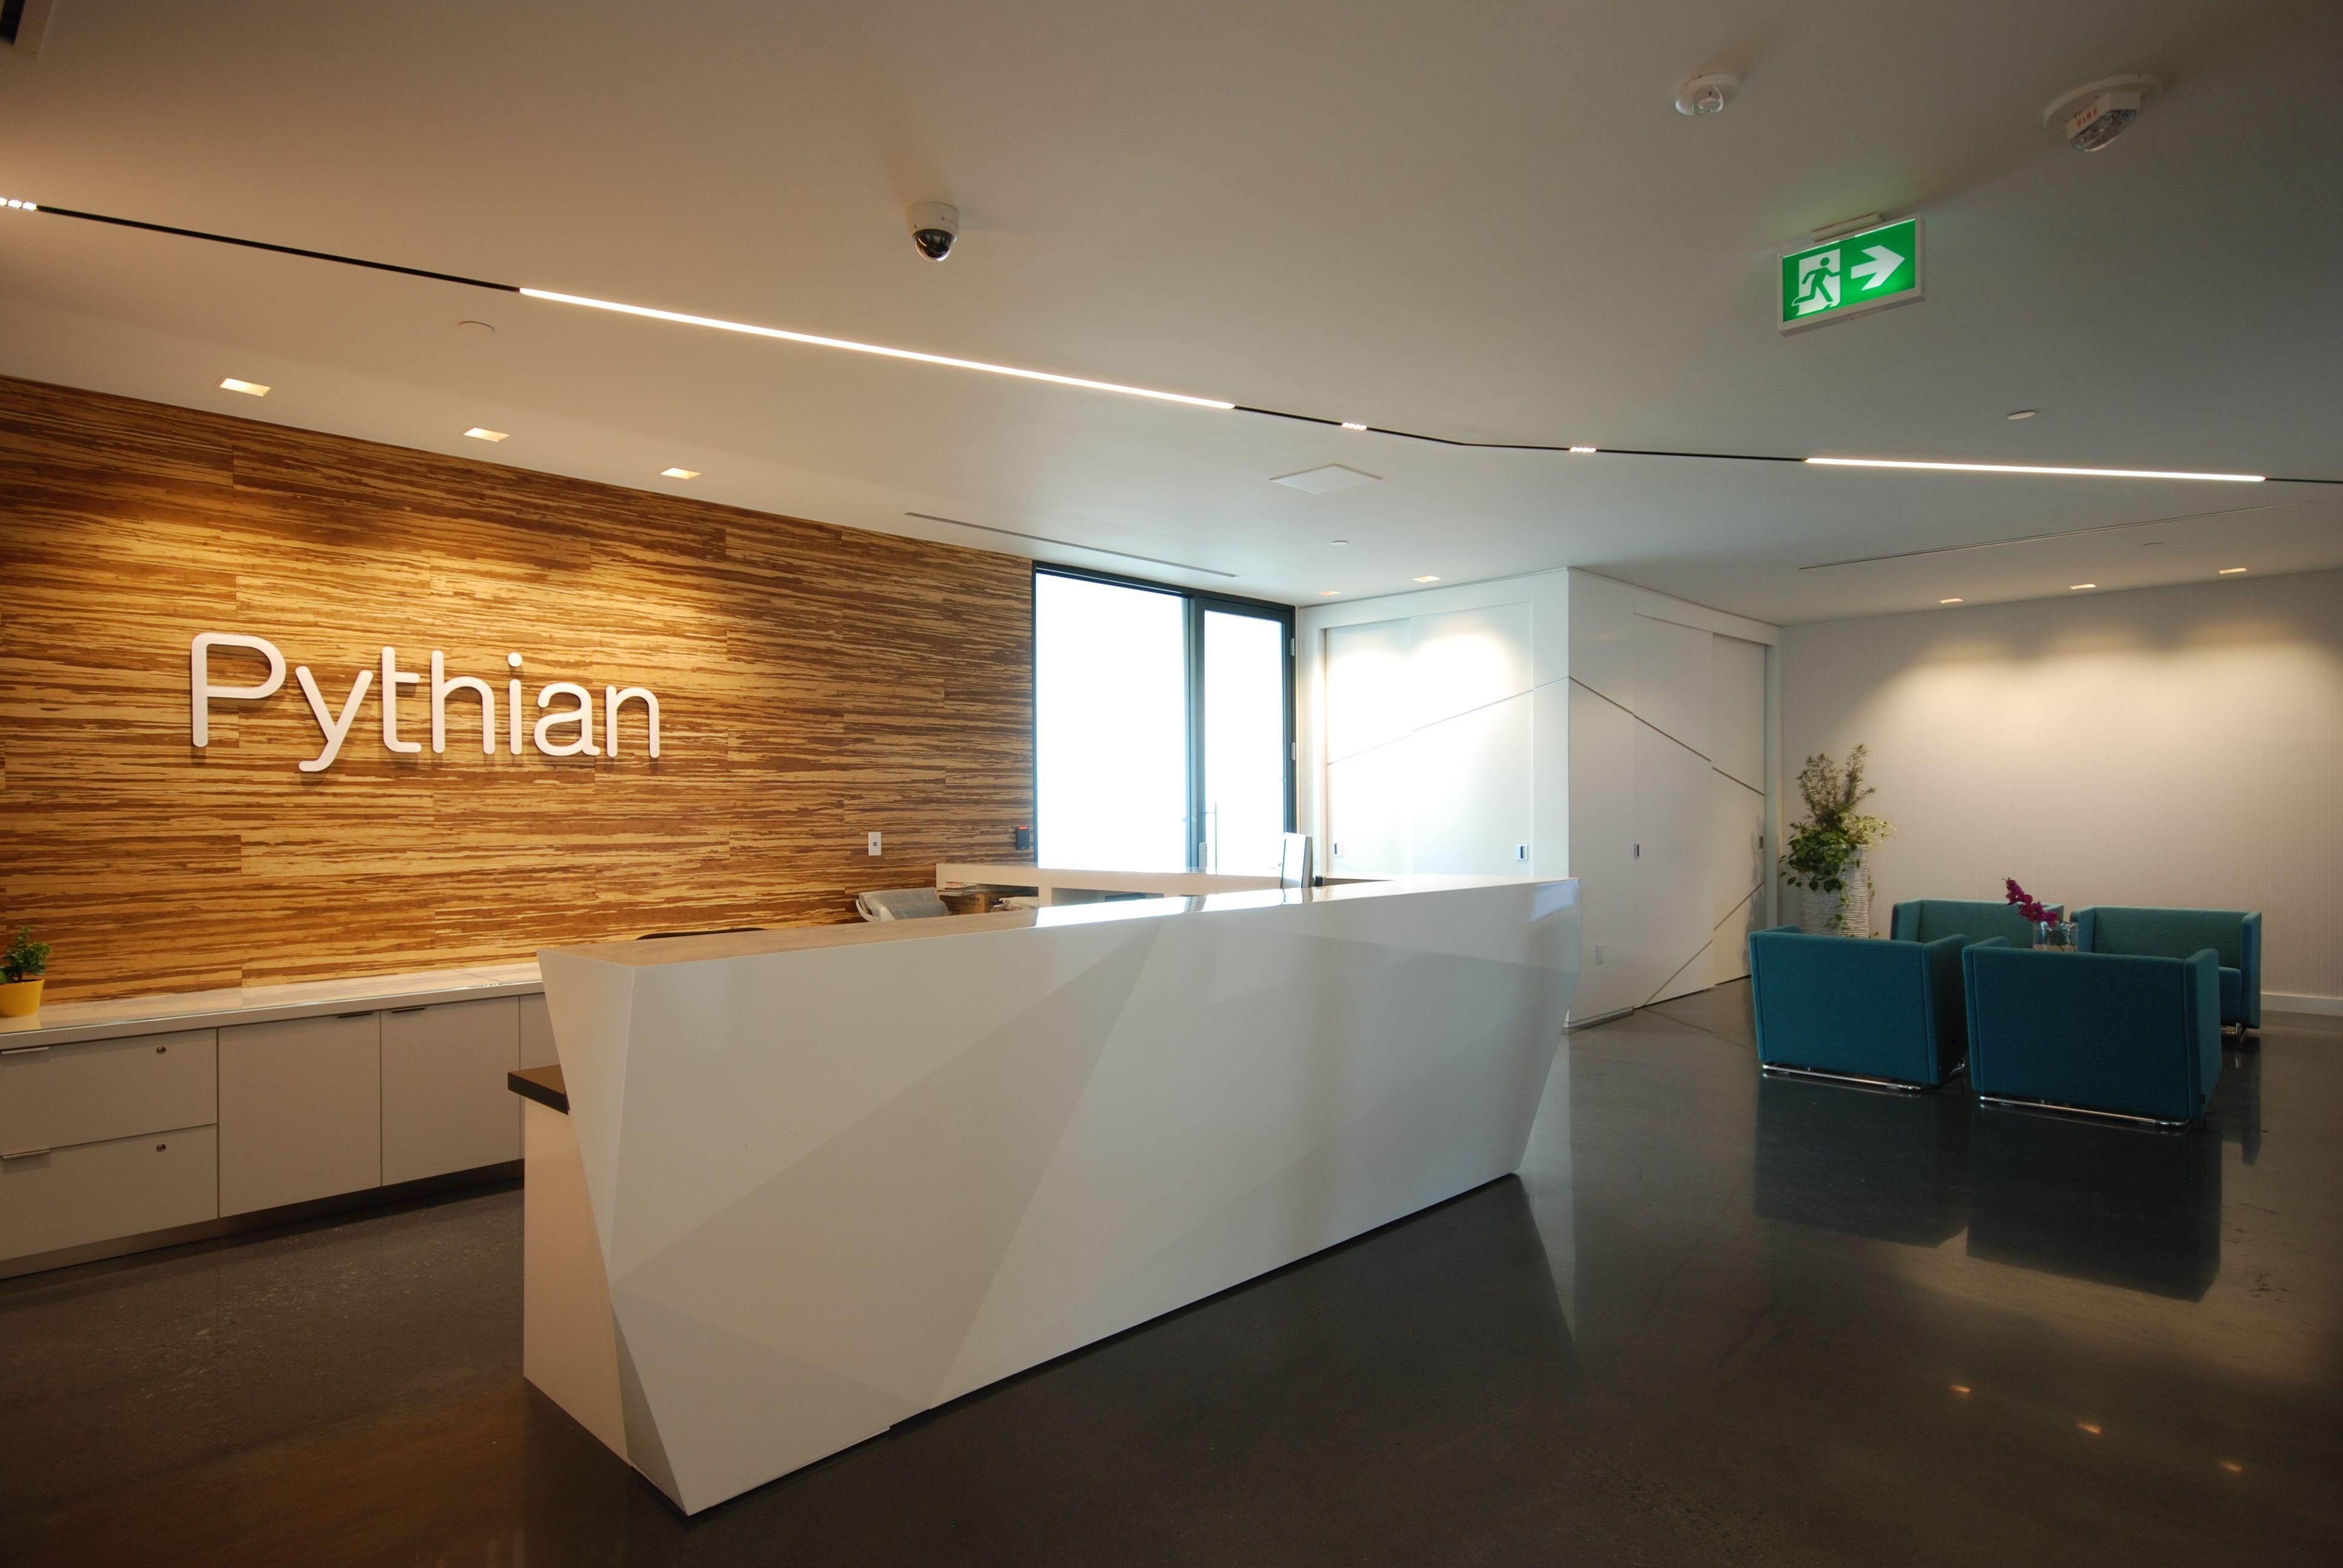 delta light linear light office reception area pythian ottawa